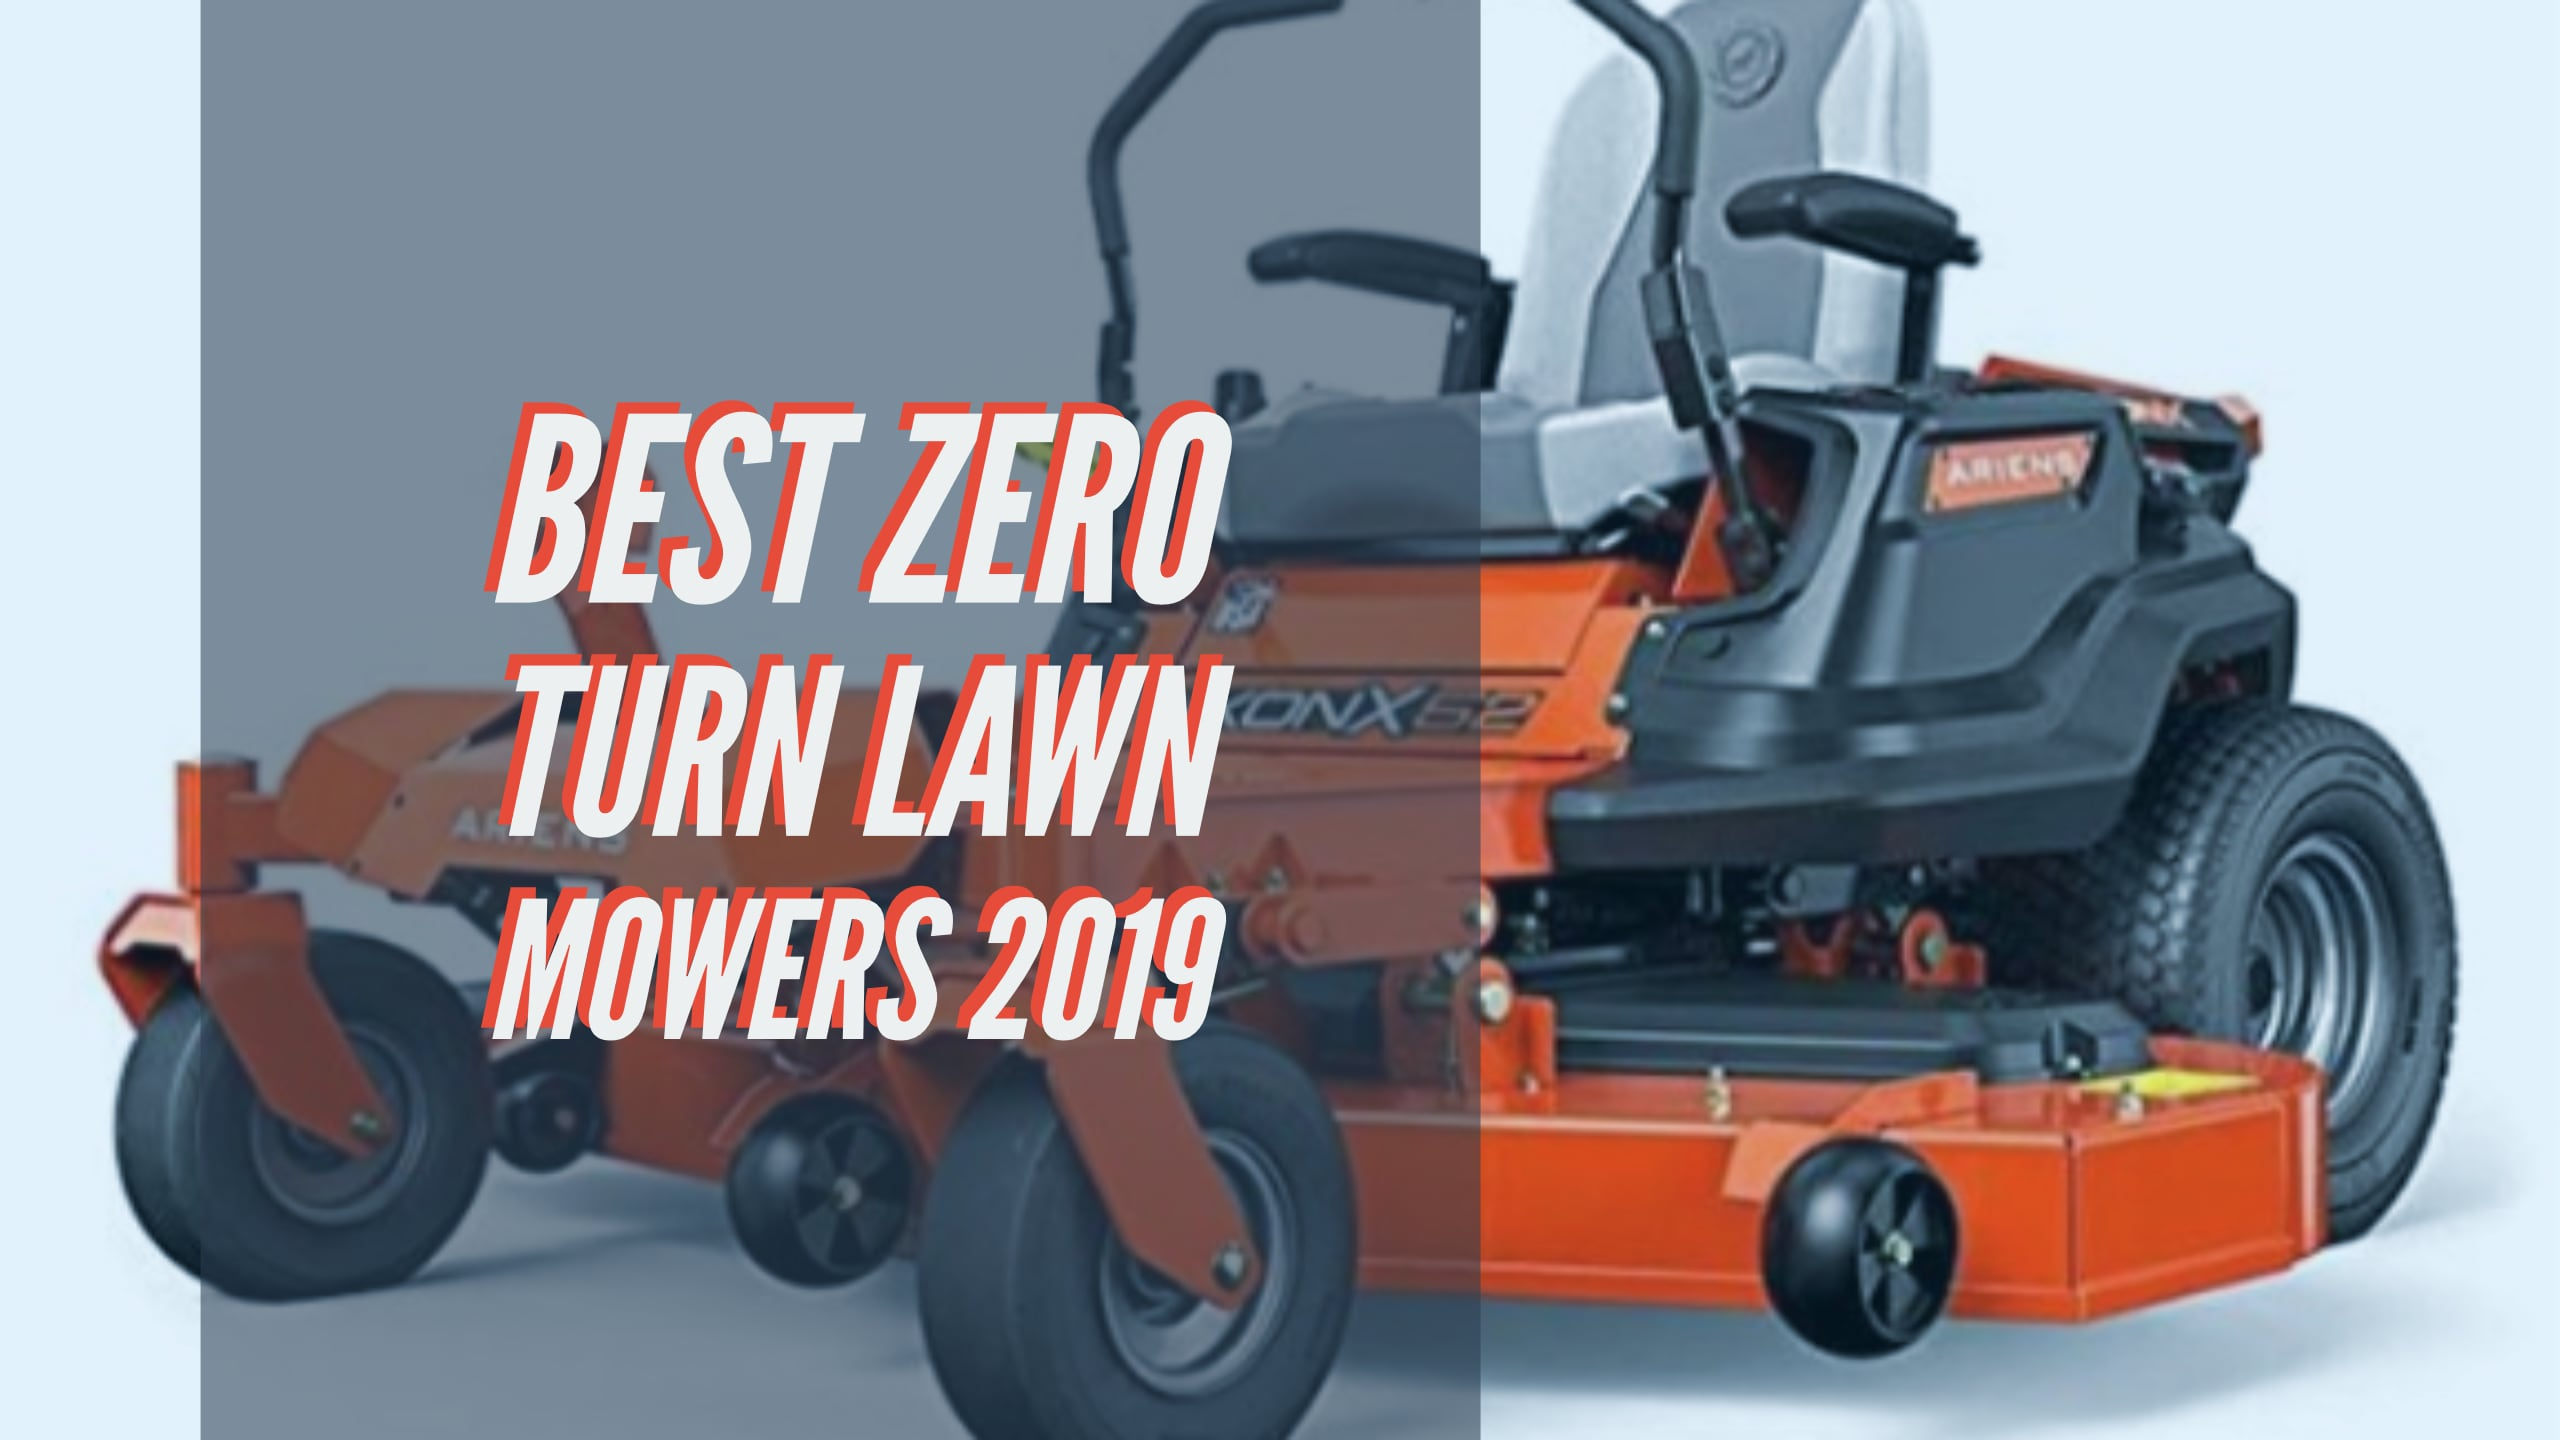 7 Best Zero Turn Lawn Mowers 2019 Reviews & Buying Guide